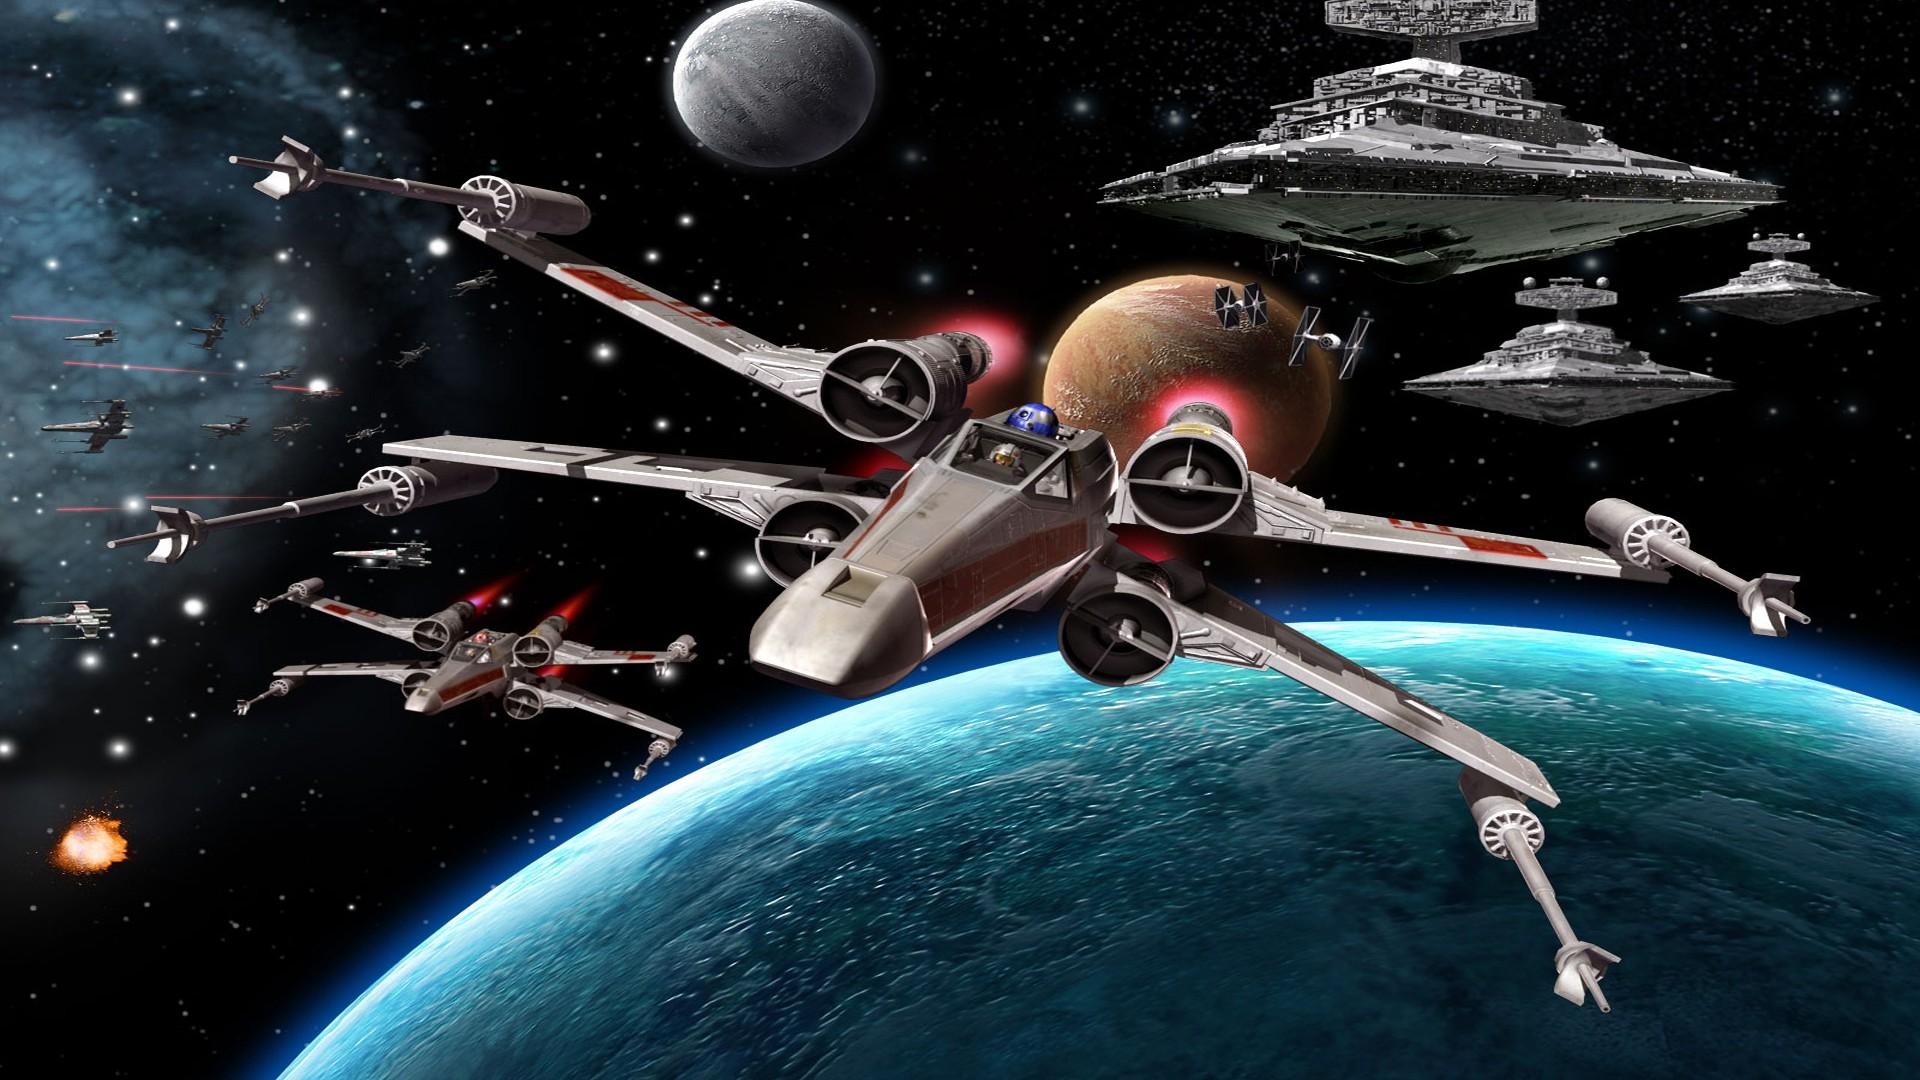 Star Wars Wallpaper 1920x1080 Full Hd 2426909 Hd Wallpaper Backgrounds Download